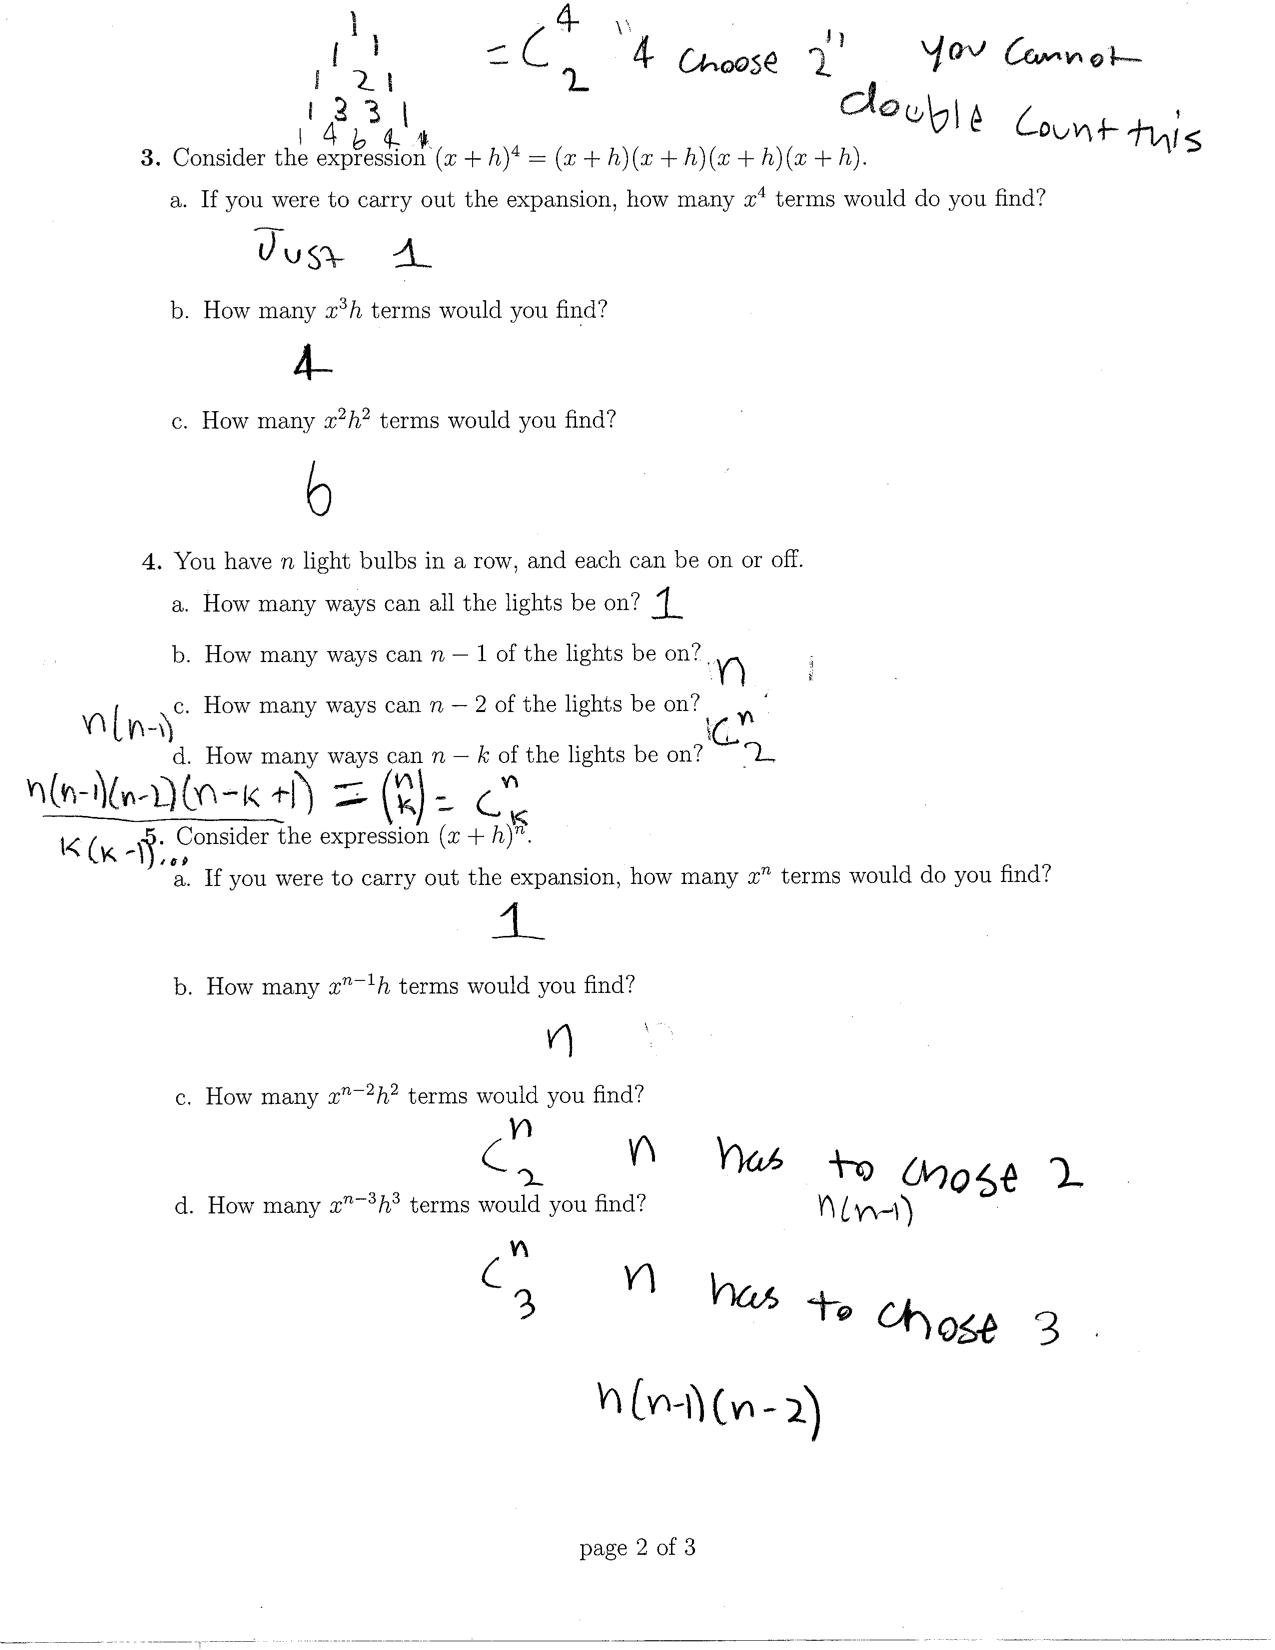 Expanding Binomials Using Pascals Triangle Worksheet